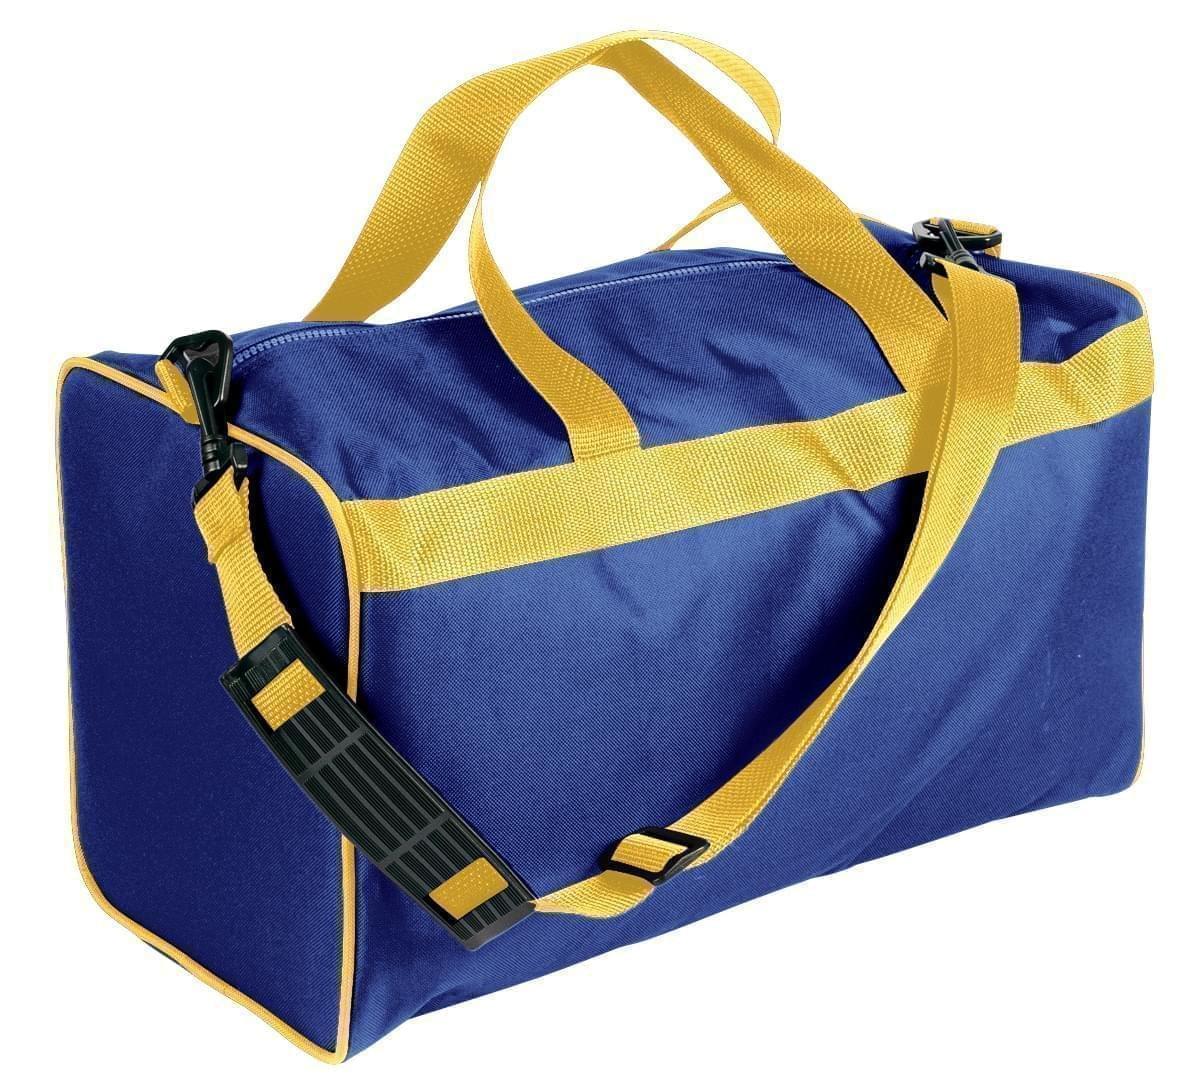 USA Made Nylon Poly Weekend Duffles, Royal Blue-Gold, WLKX31AA05